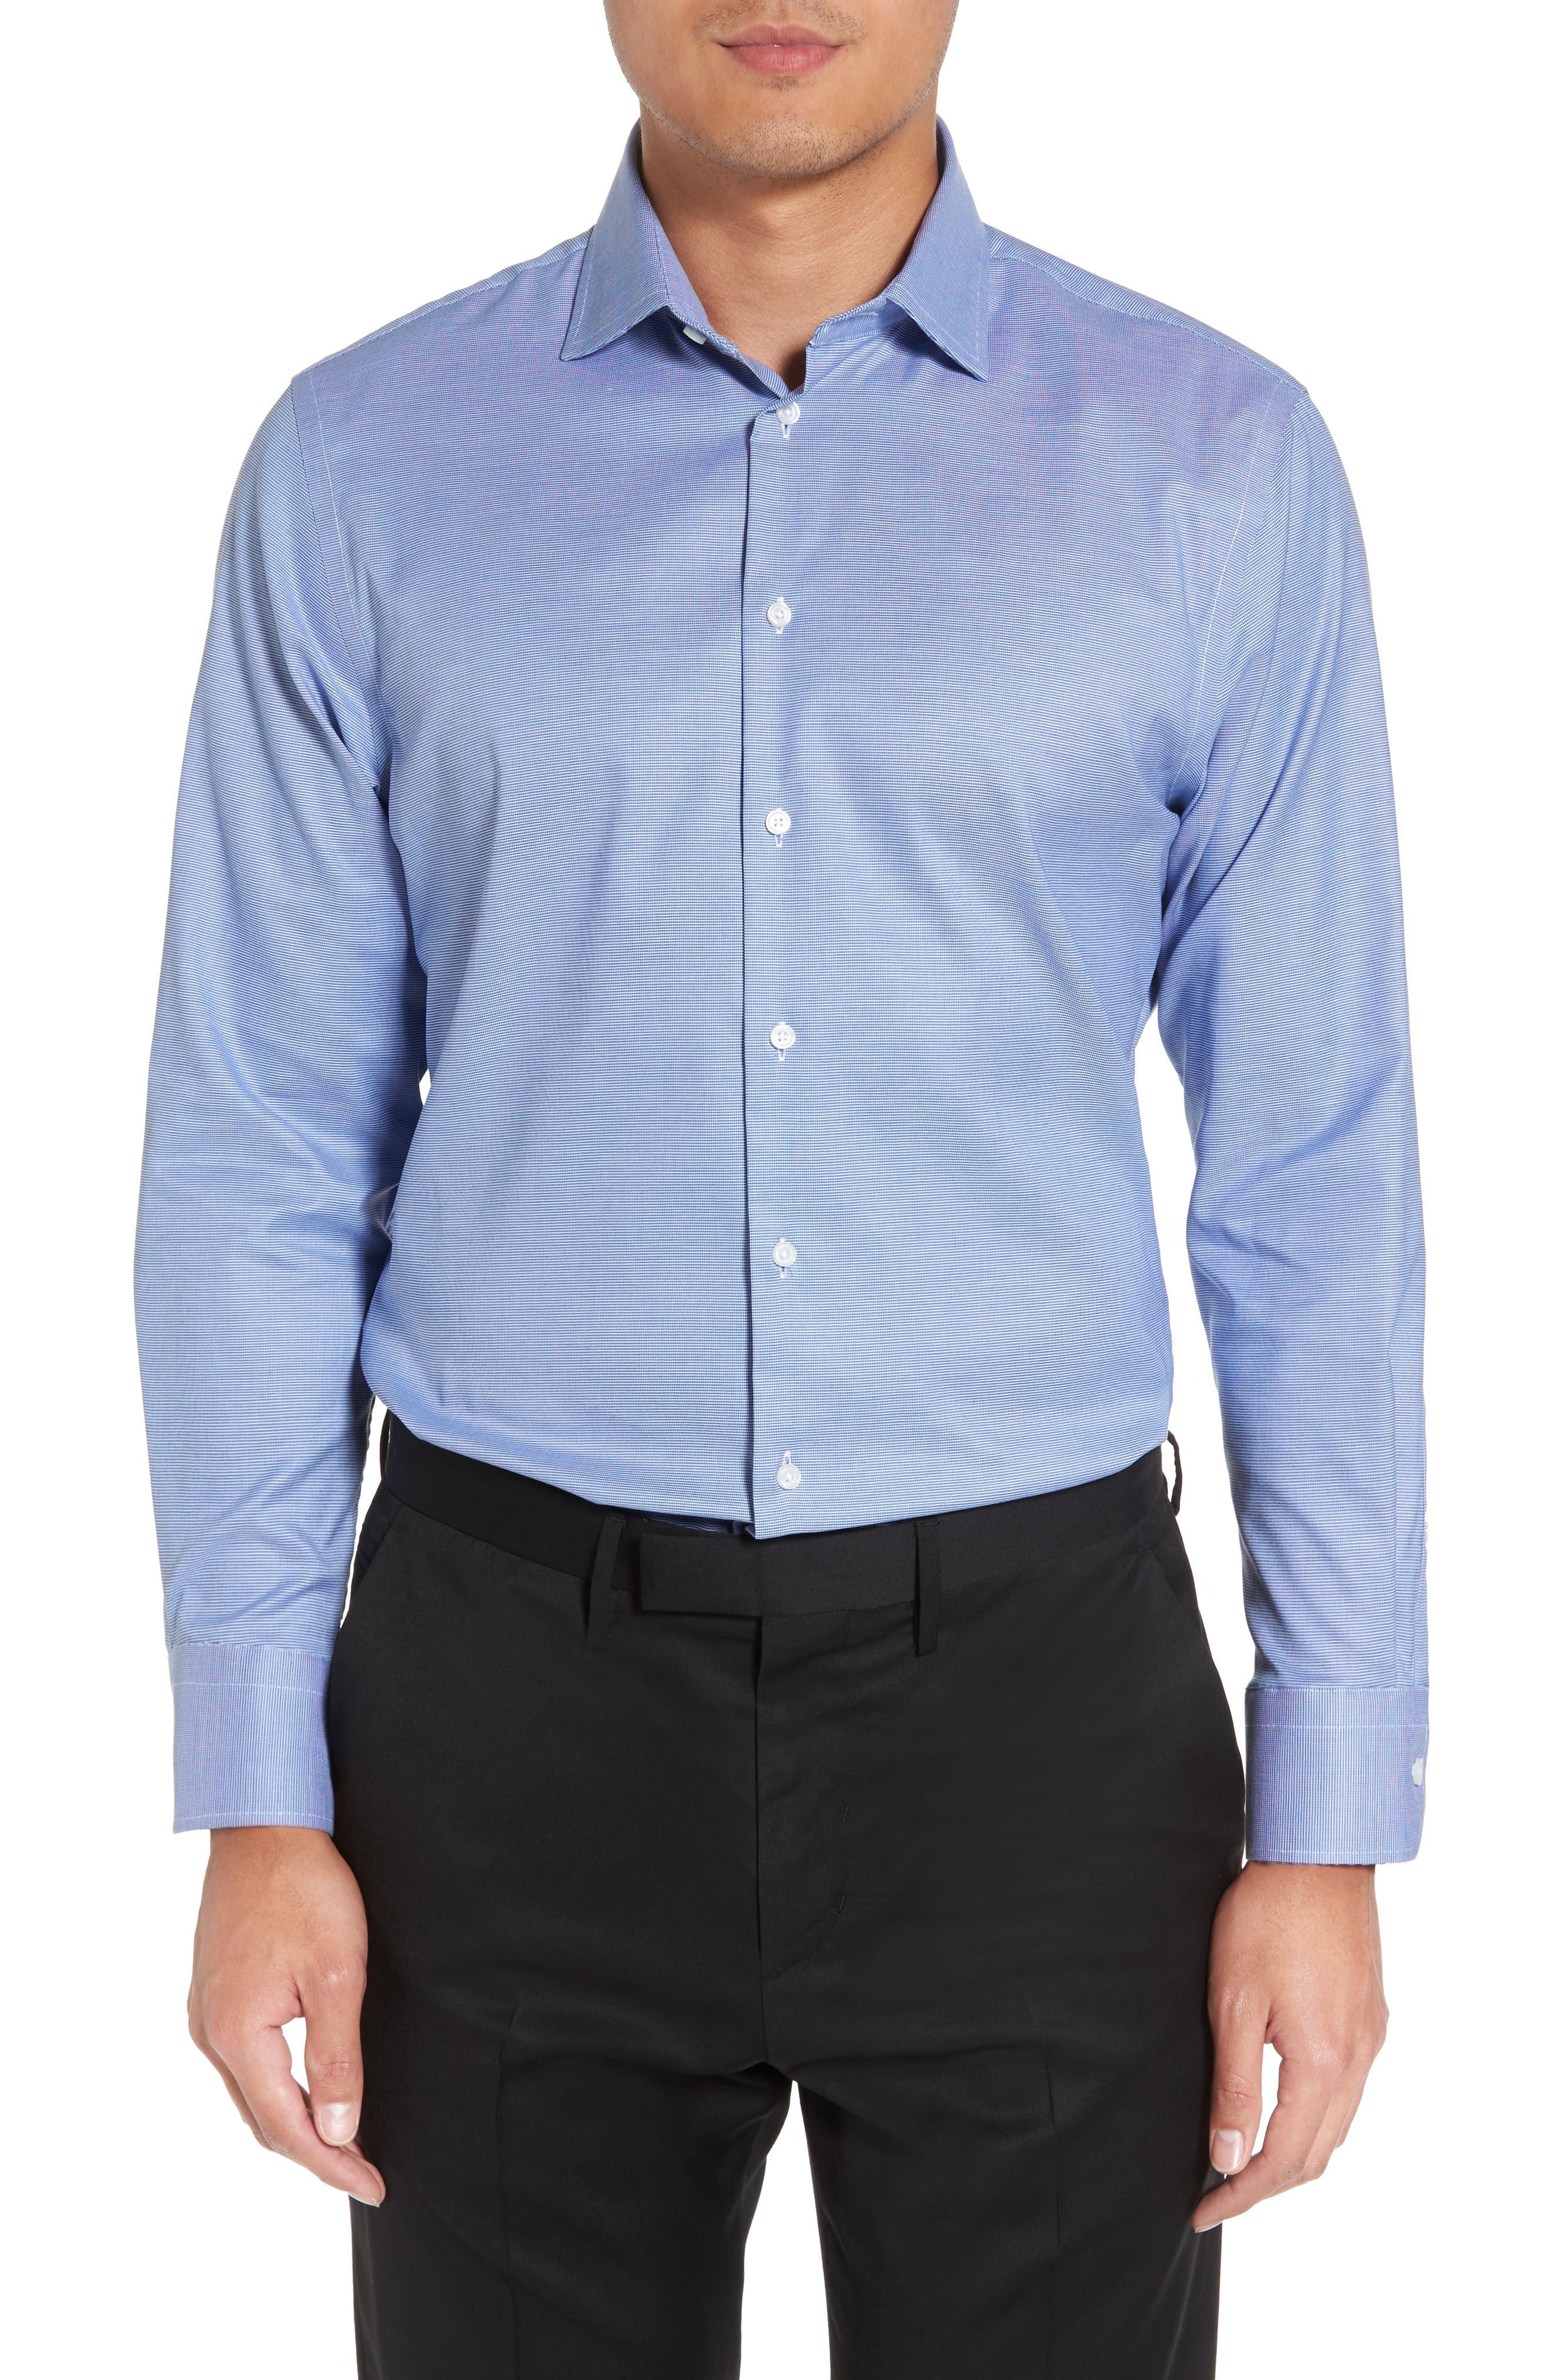 Trim Fit Non-Iron Dress Shirt,                             Main thumbnail 1, color,                             Blue Sodalite